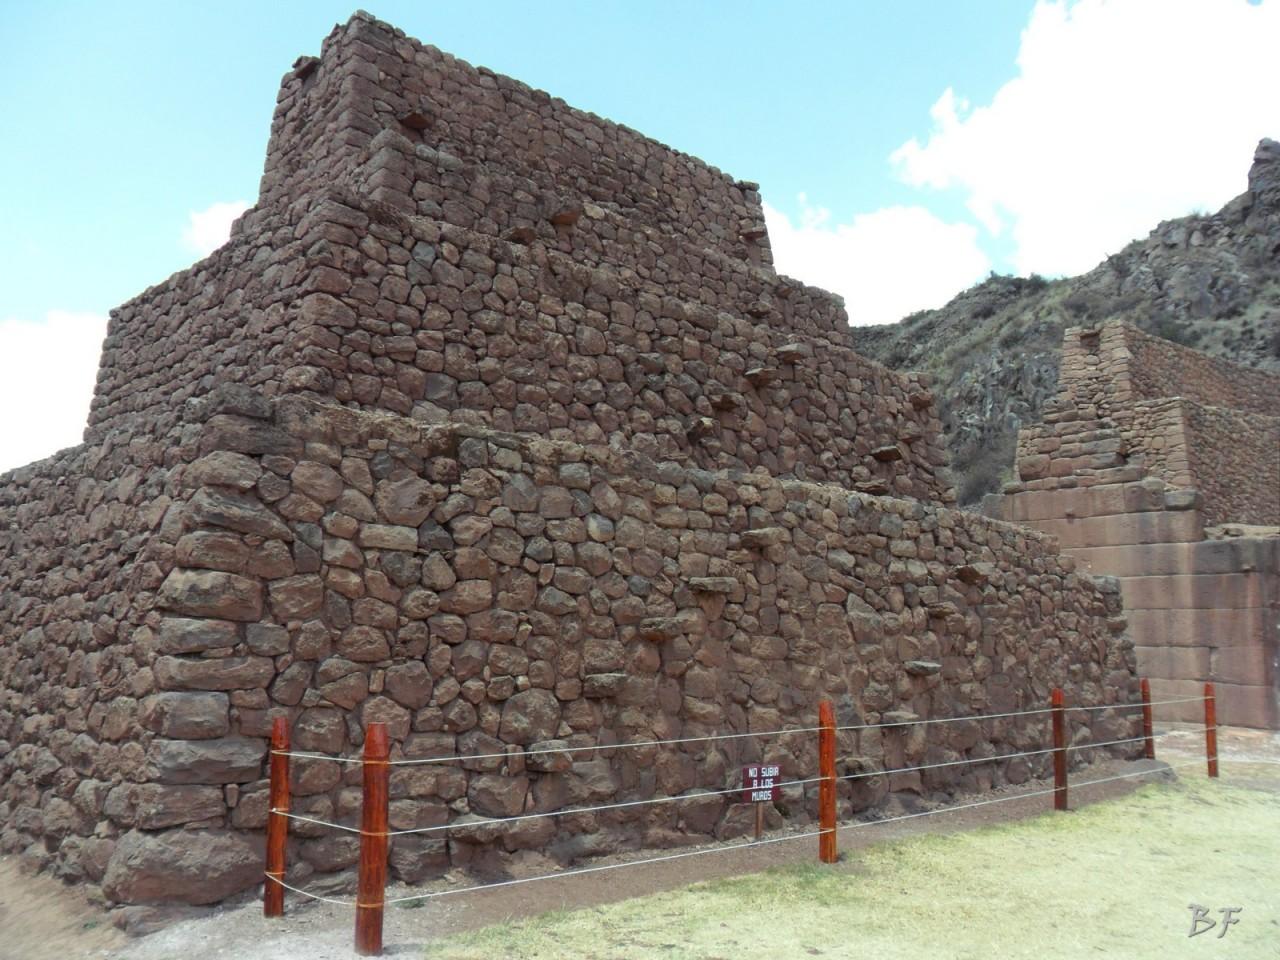 Parco-Archeologico-Megaliti-Rumicolca-Cusco-Perù-5